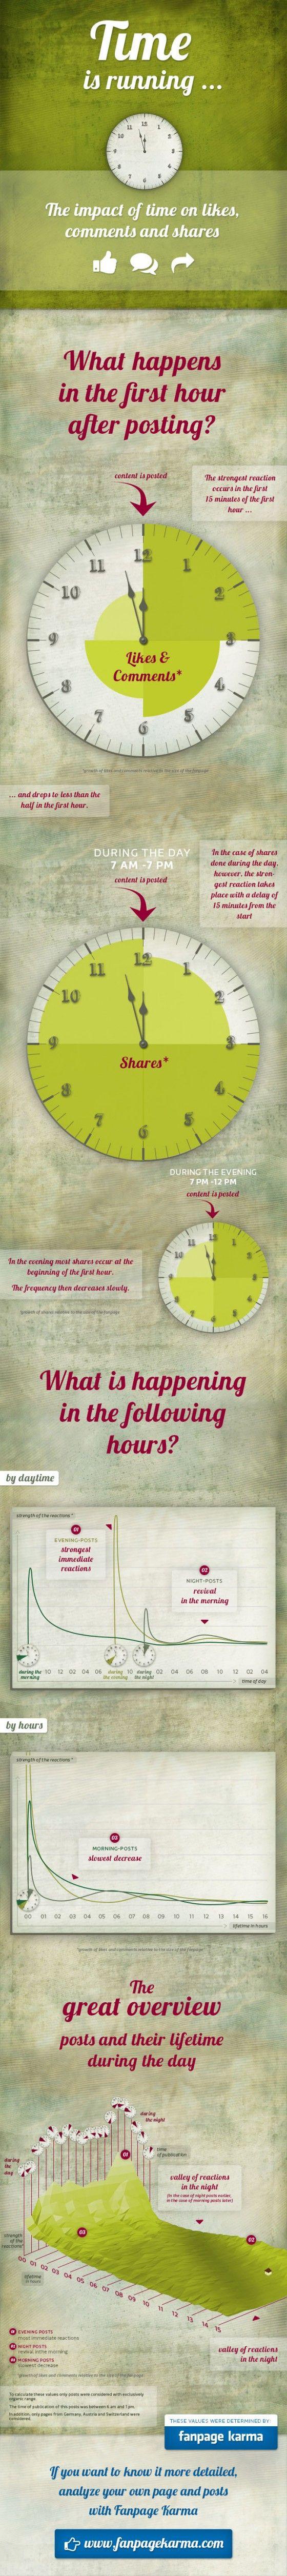 limportance du timing sur facebook socialmedia